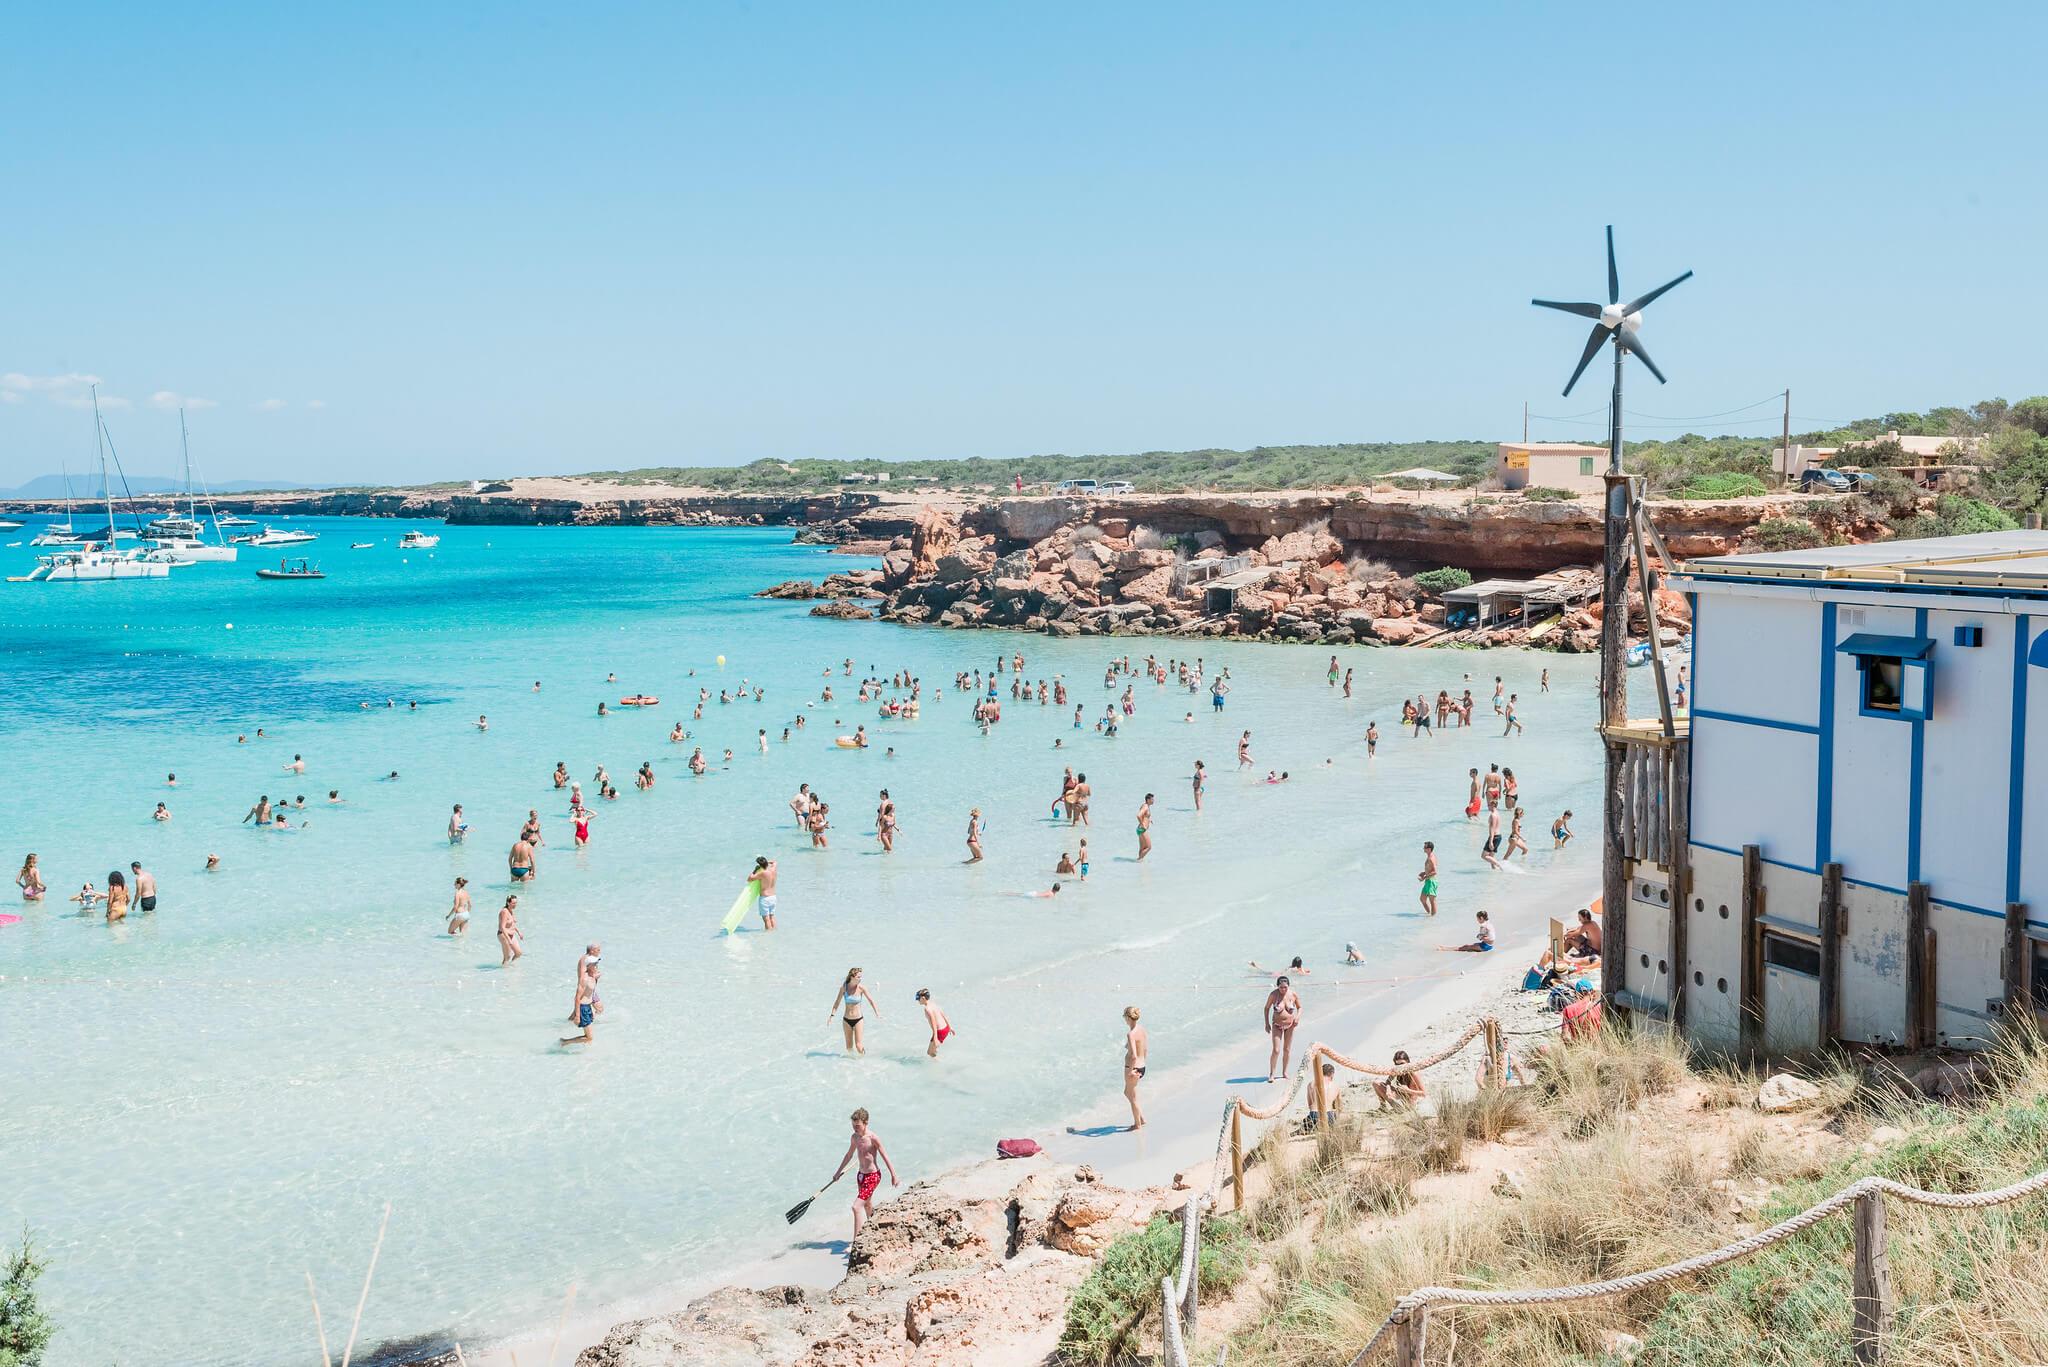 https://www.white-ibiza.com/wp-content/uploads/2020/03/formentera-beaches-cala-saona-2020-07.jpg